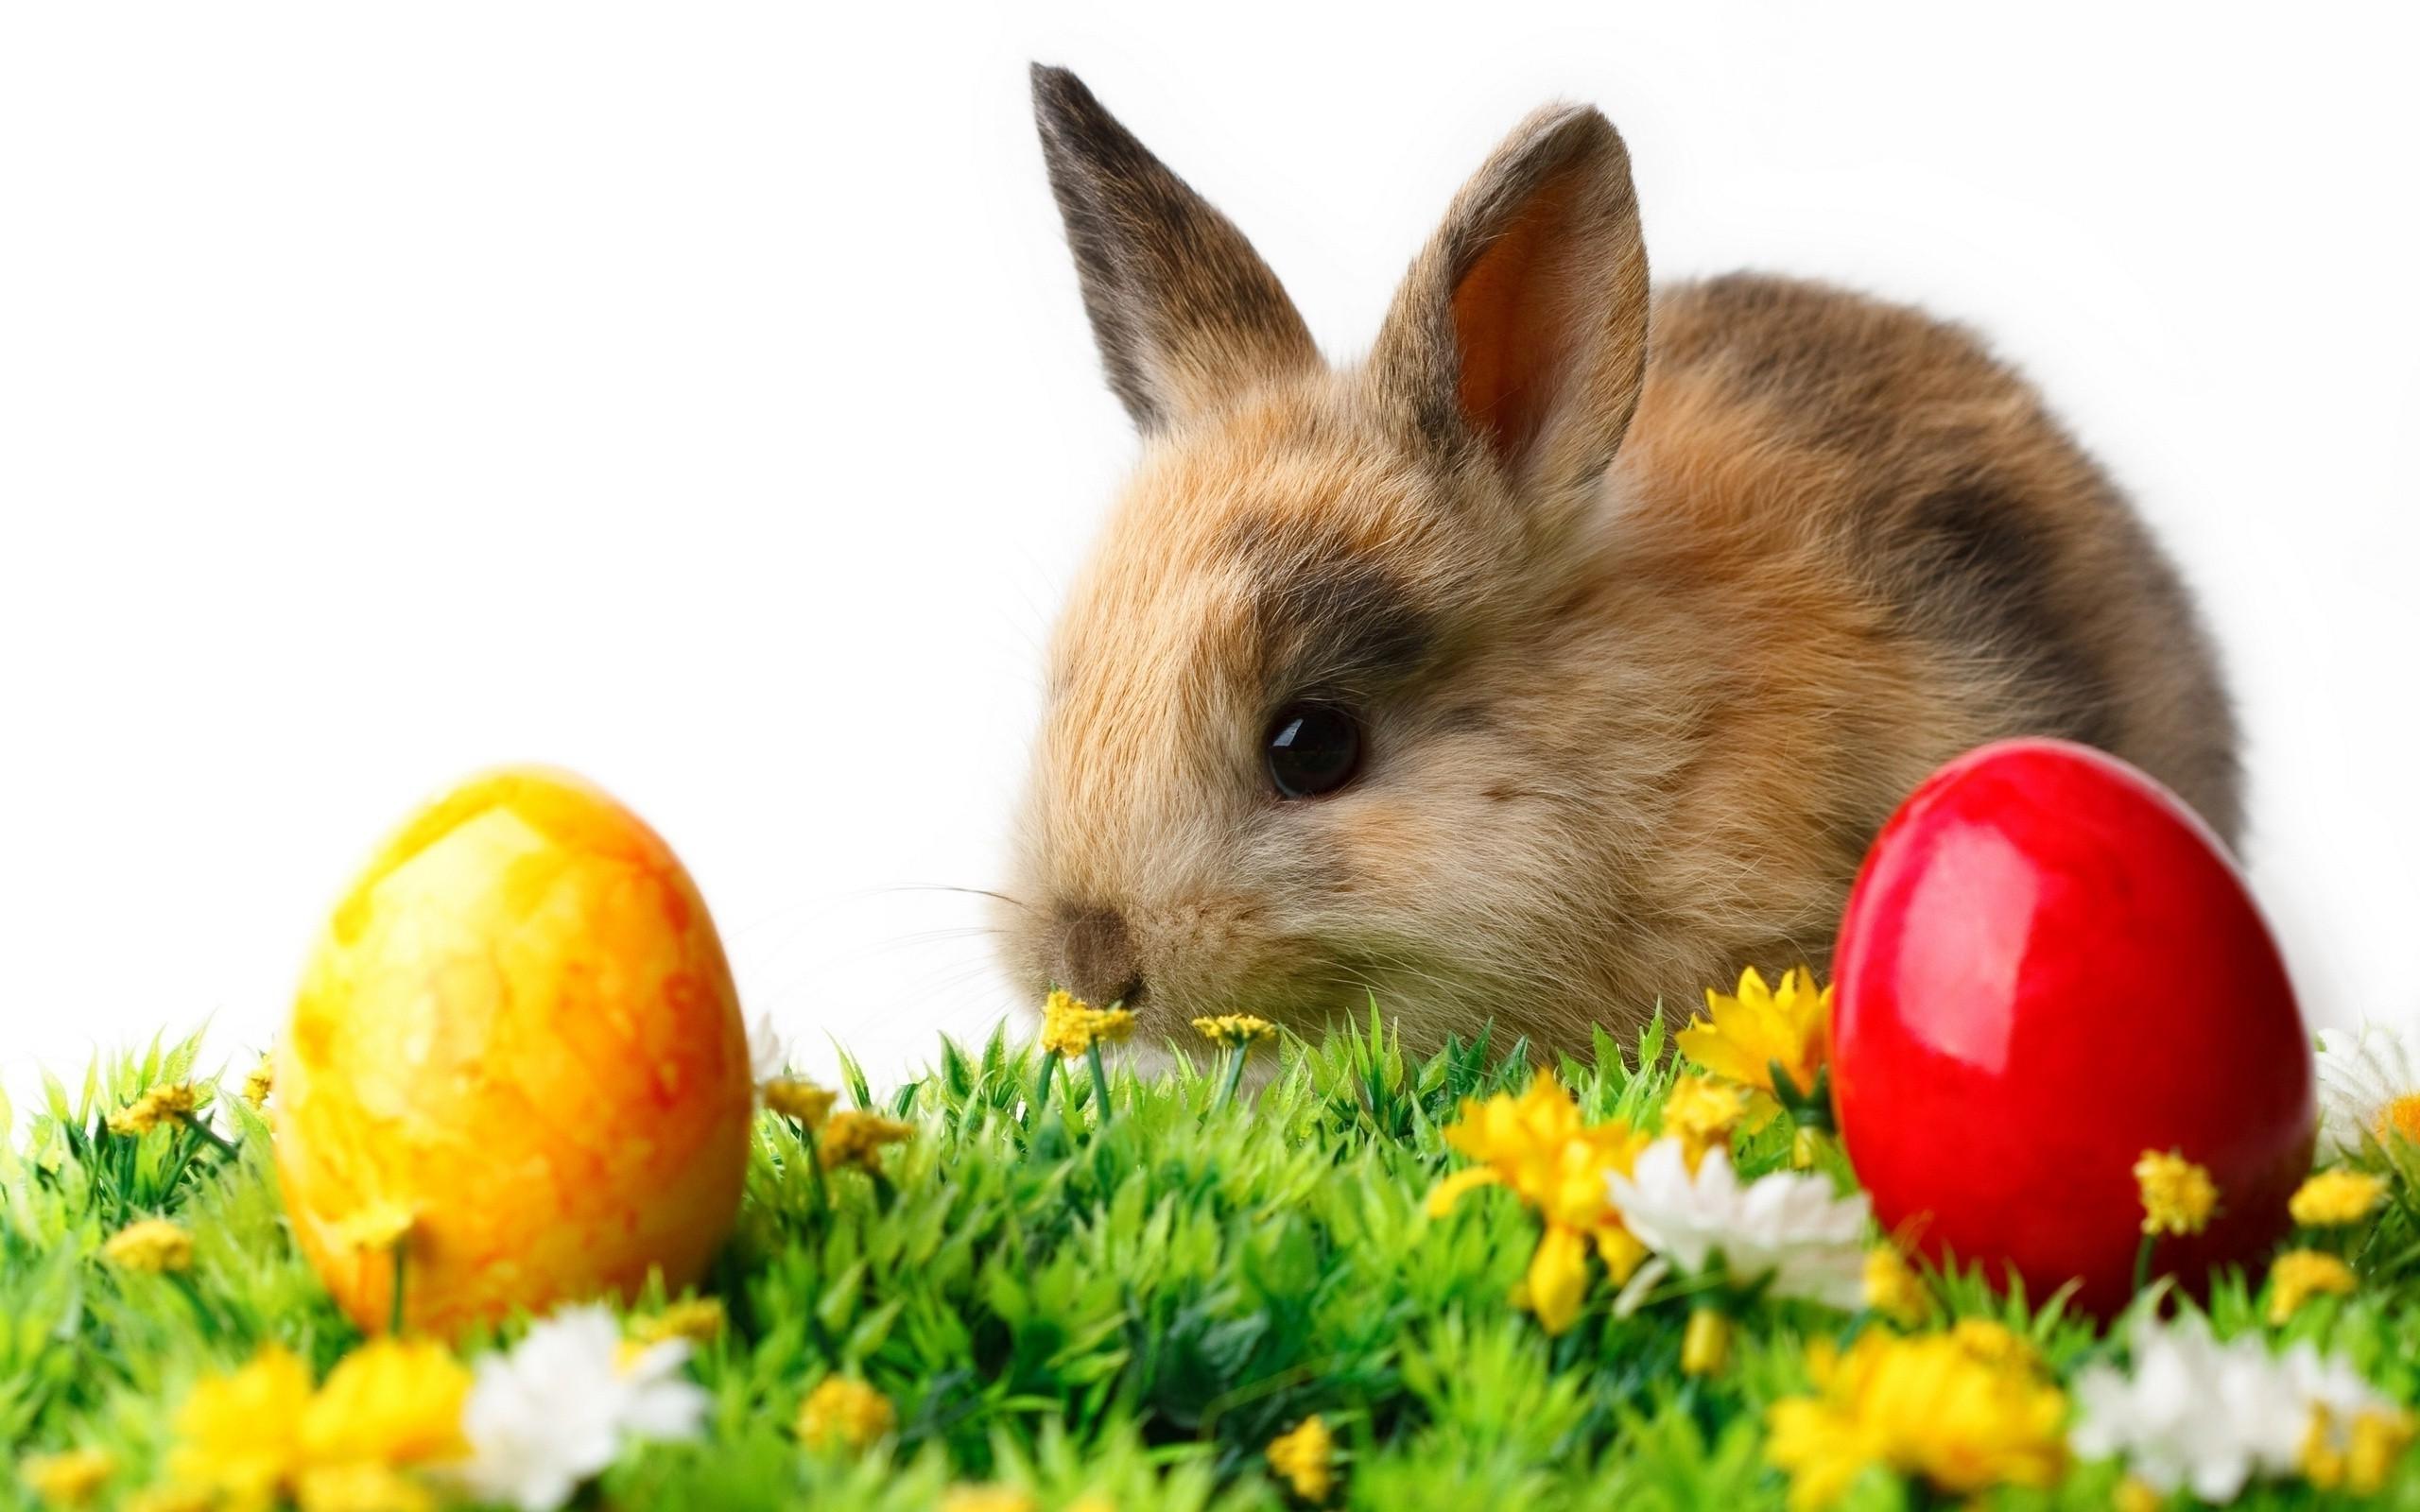 Fondos De Pantalla De Animales Bebes: Fondos De Pantalla : Animales, Huevos, Animales Bebés